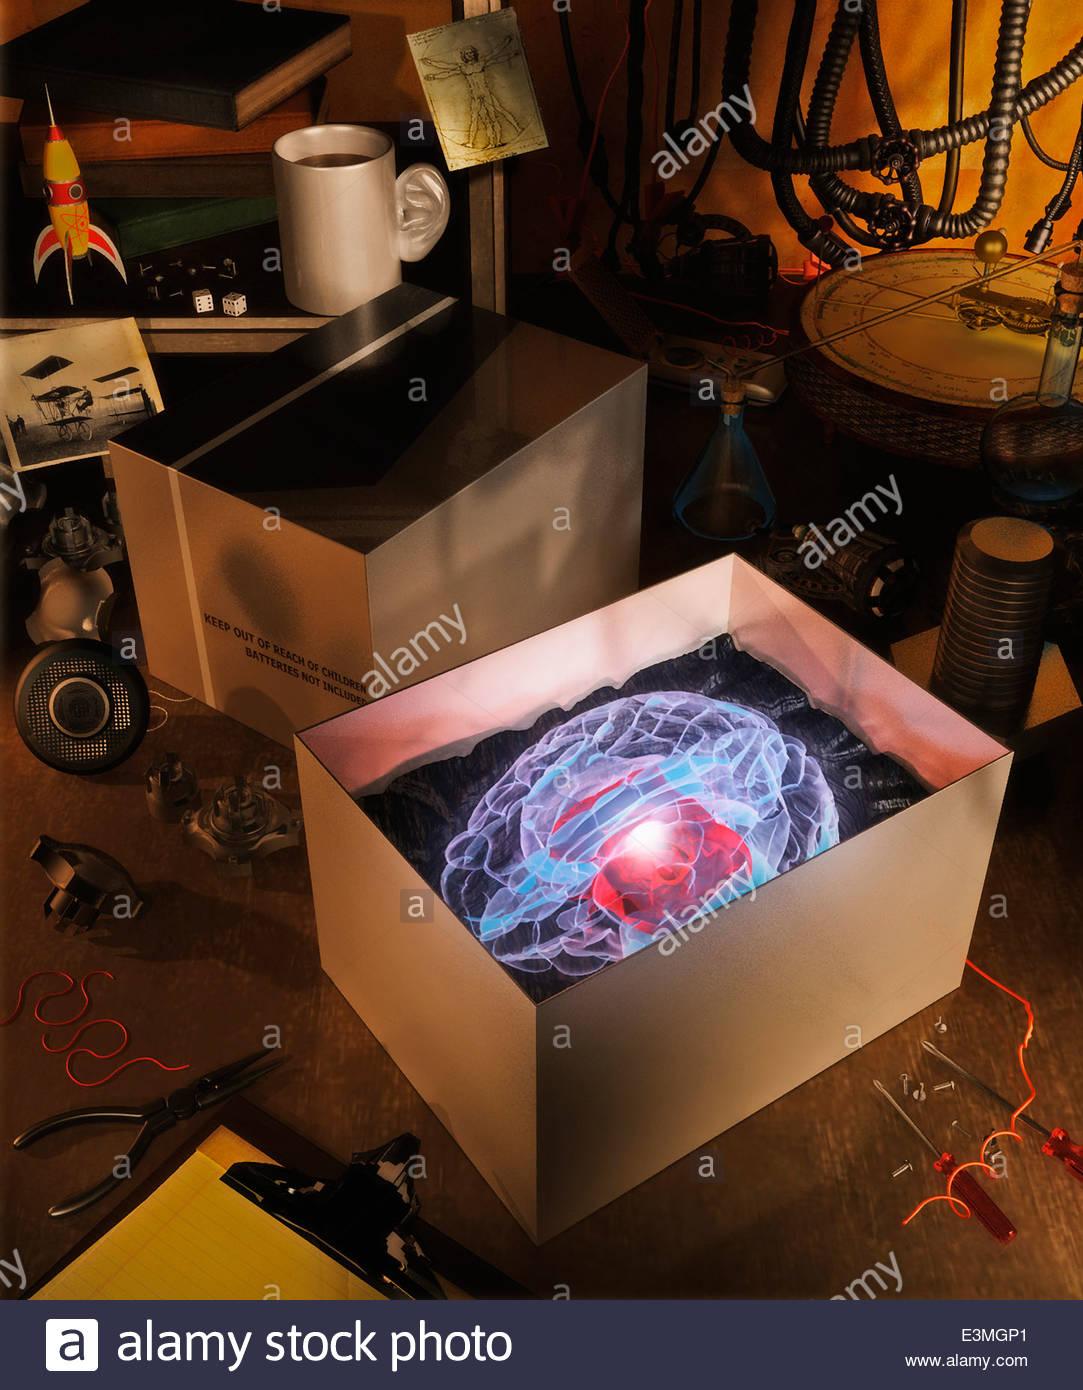 New glowing brain in box on workbench - Stock Image